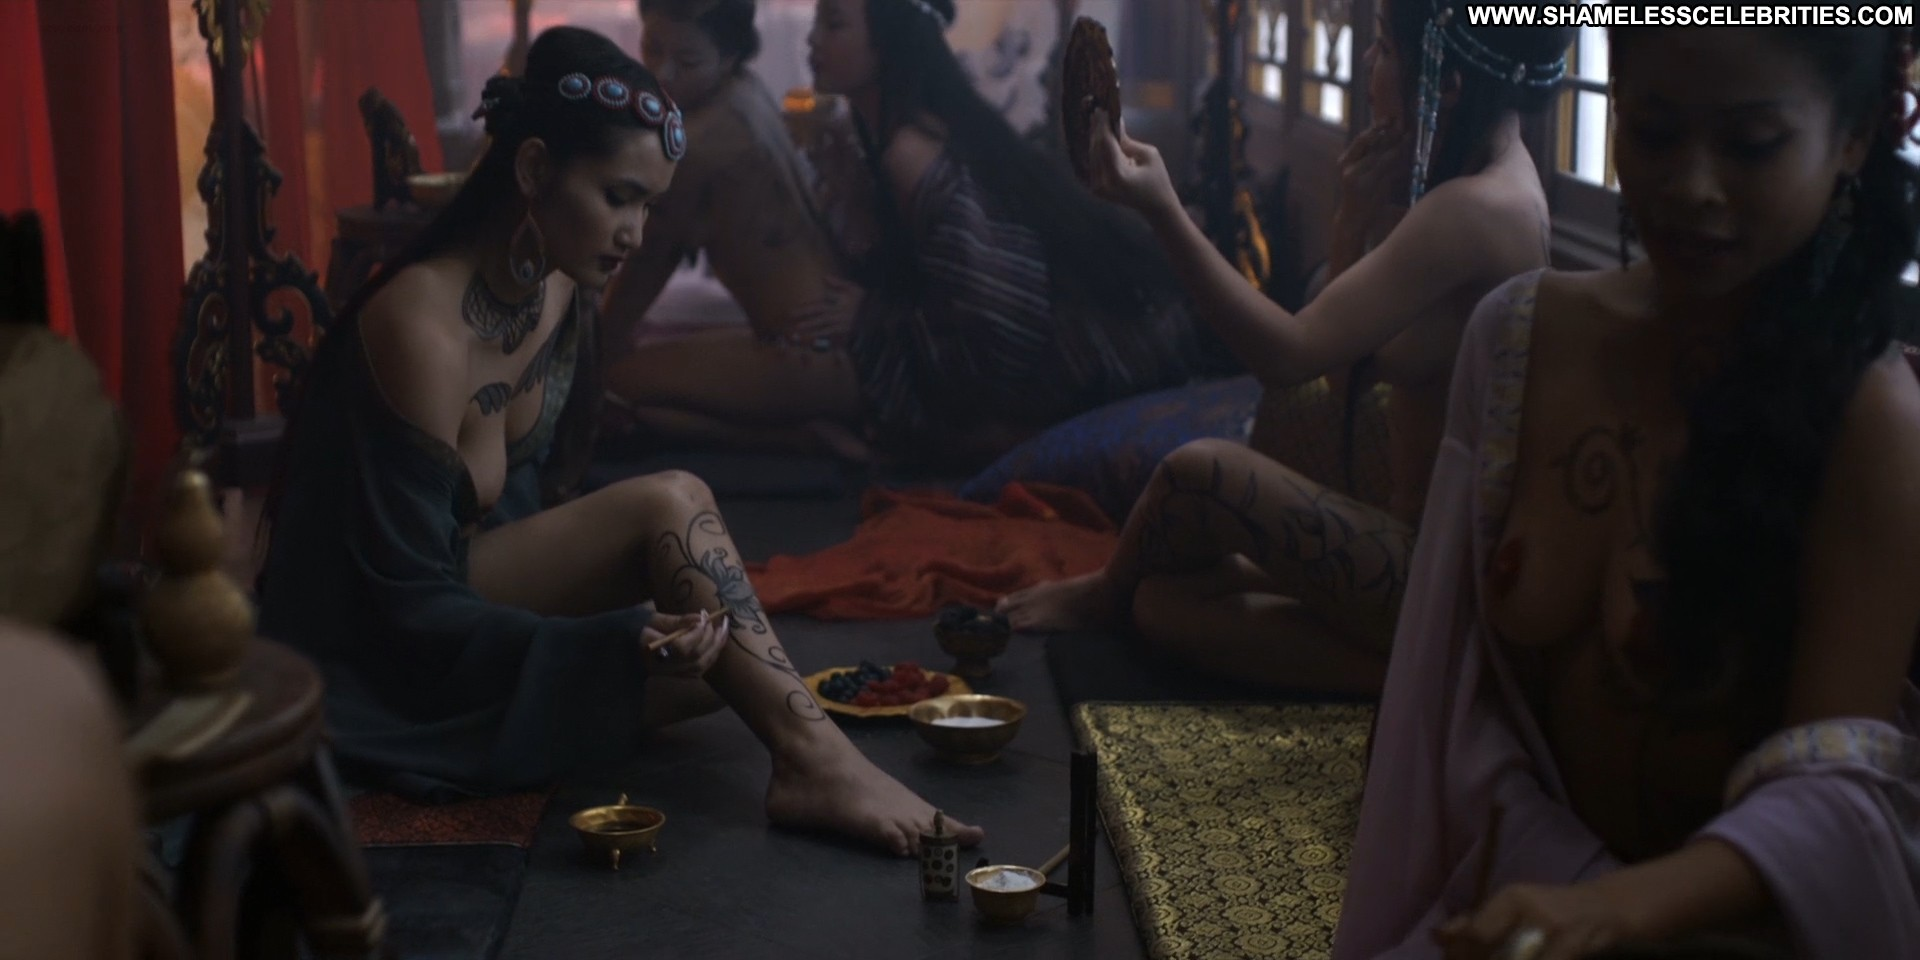 Olivia cheng nude marco polo s01e034 2